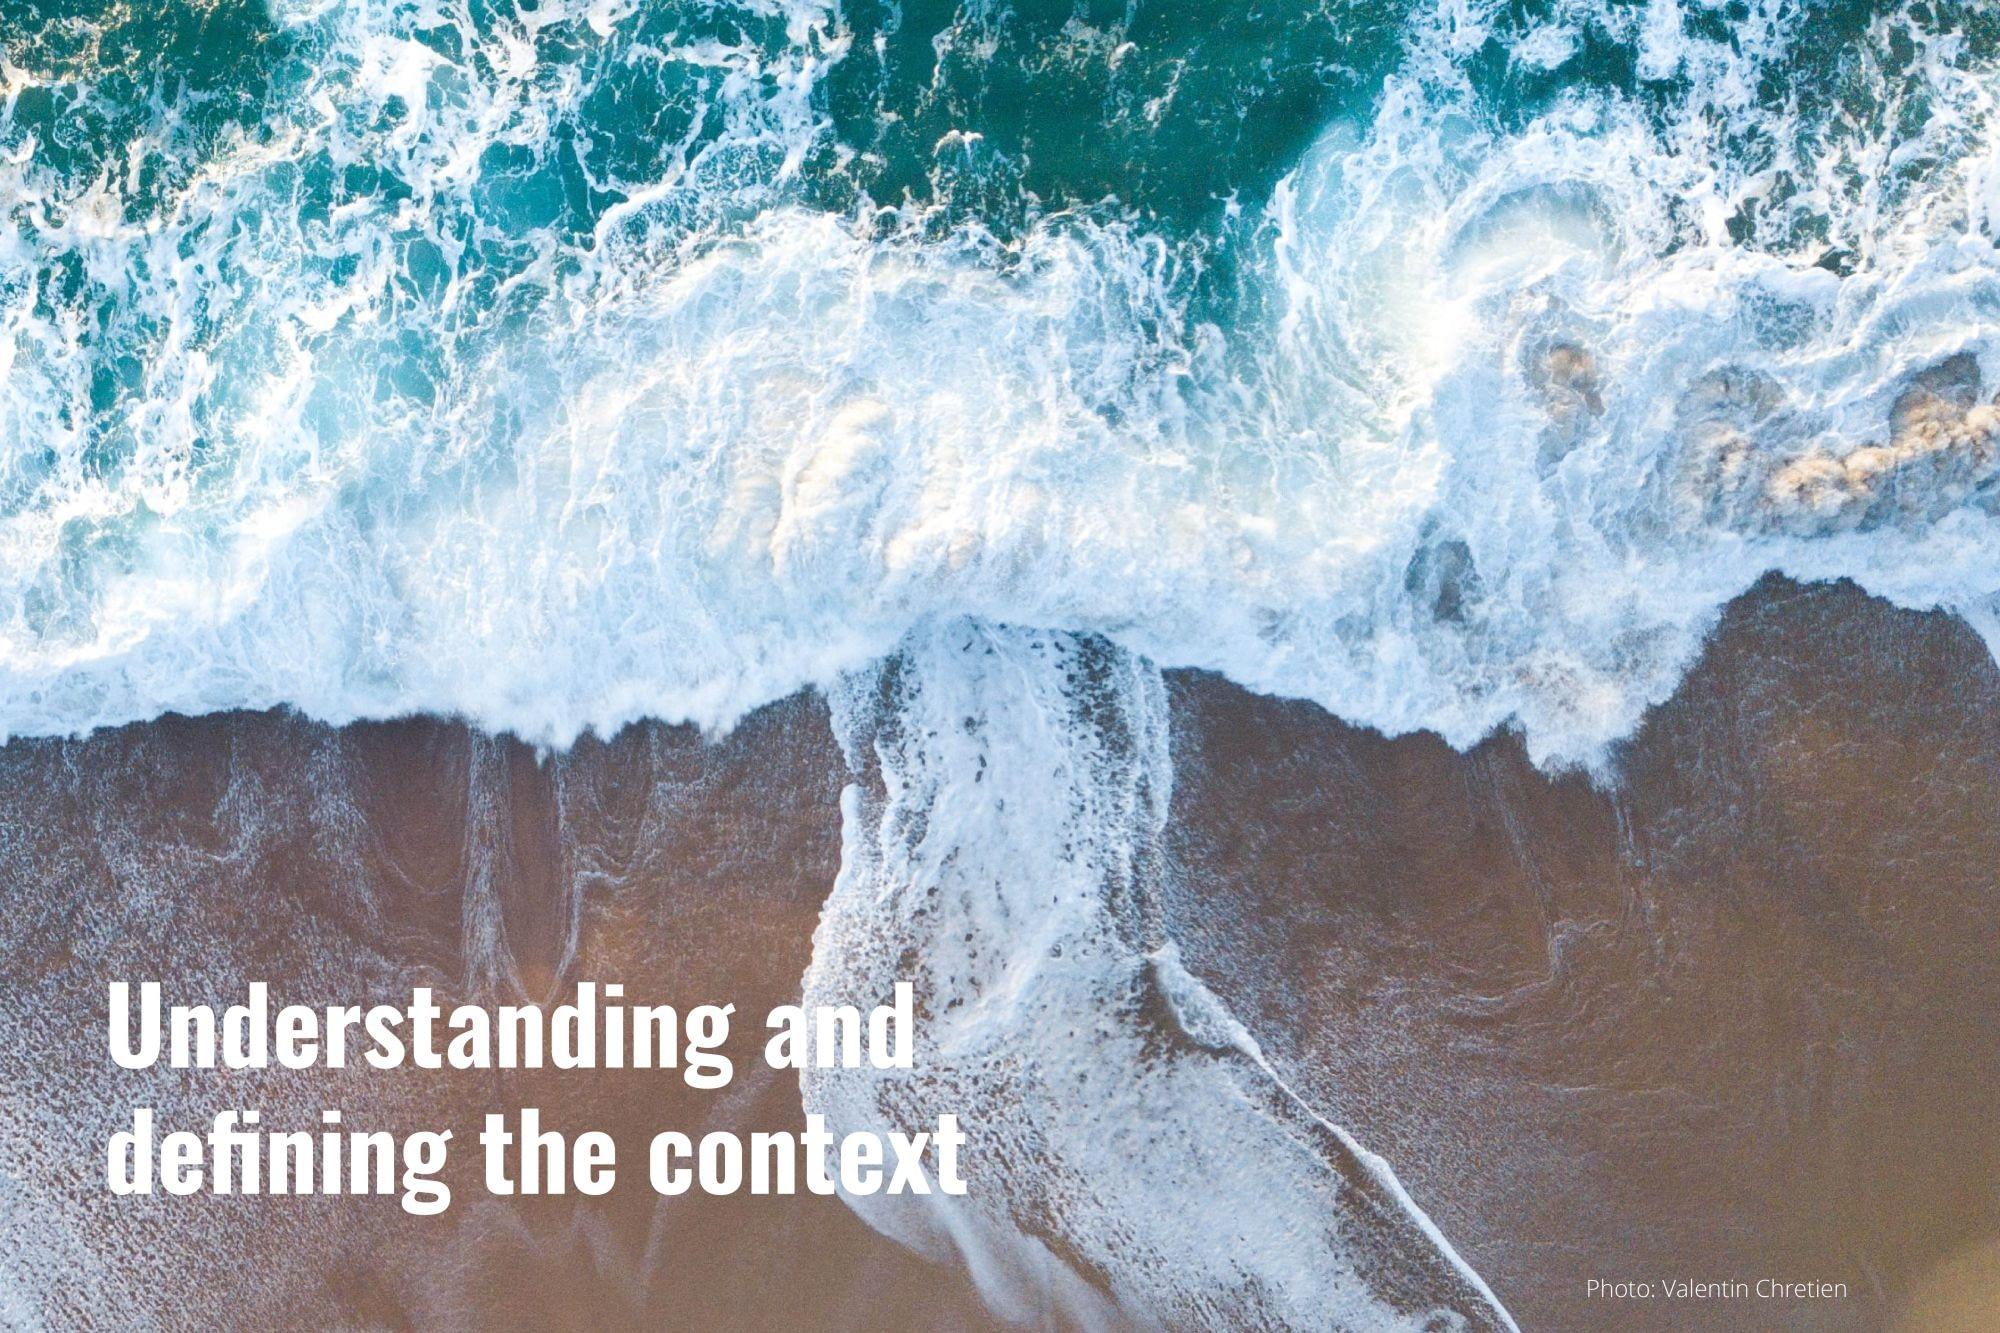 Understanding and defining the context, logo design, visual identity, randing, design, logo